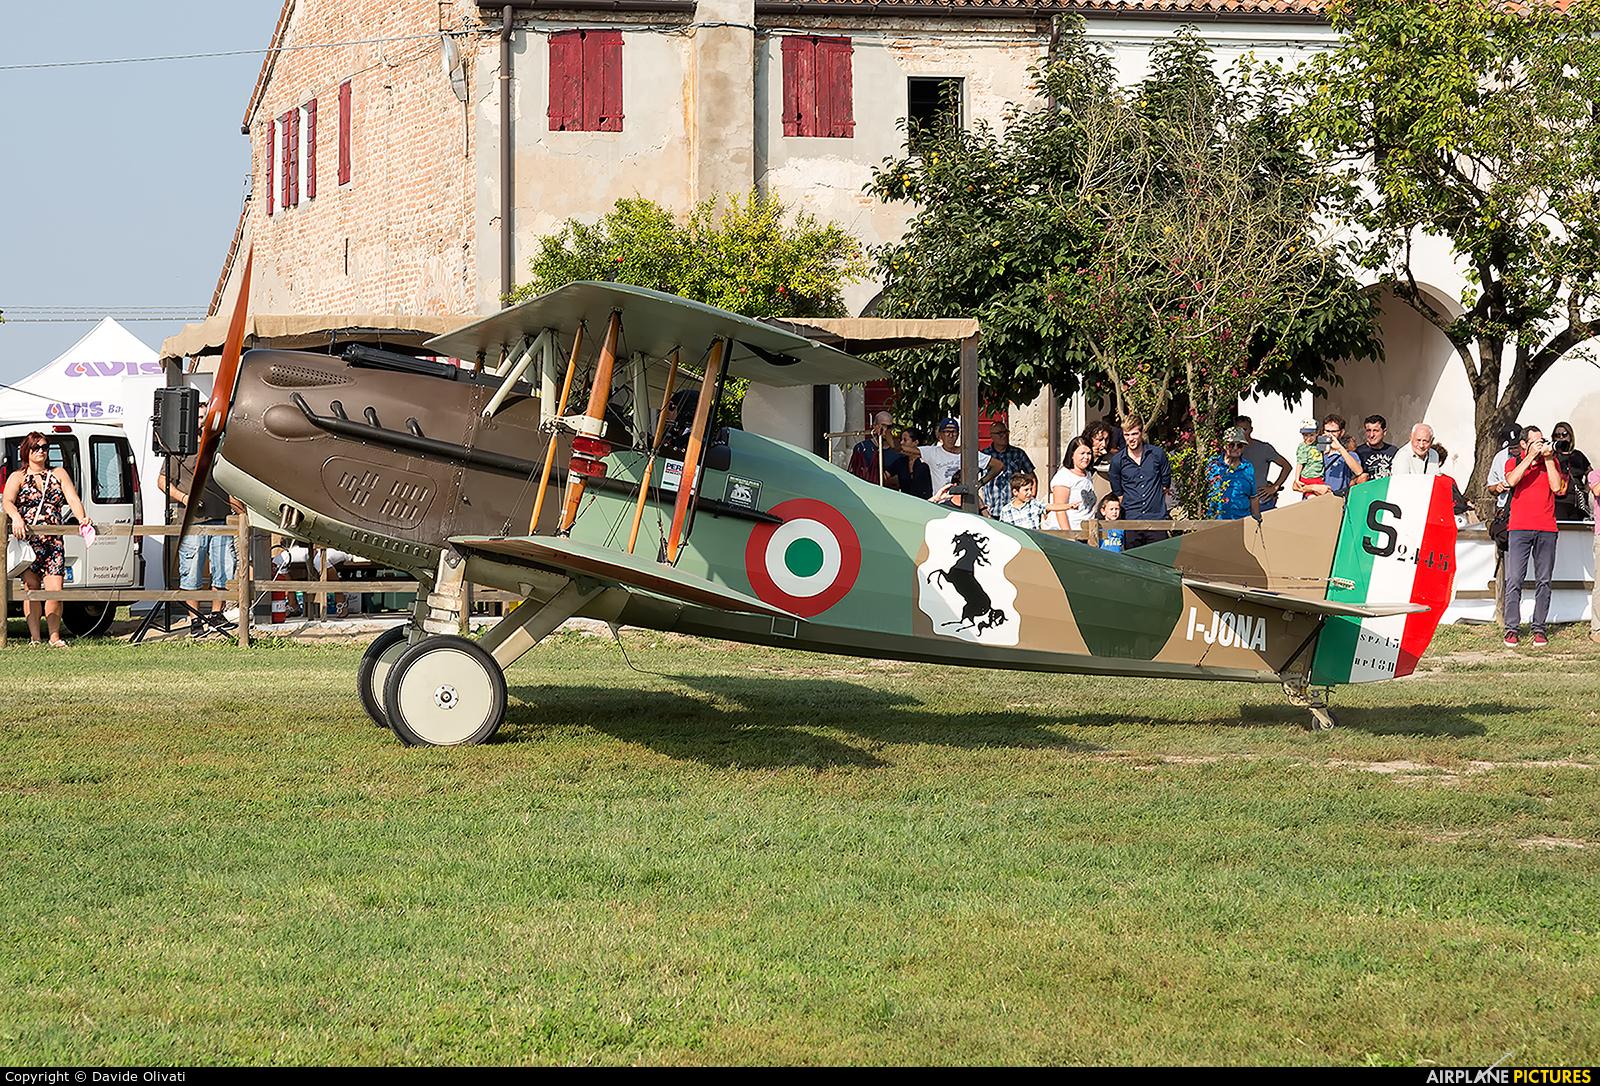 Private I-JONA aircraft at Off Airport - Italy